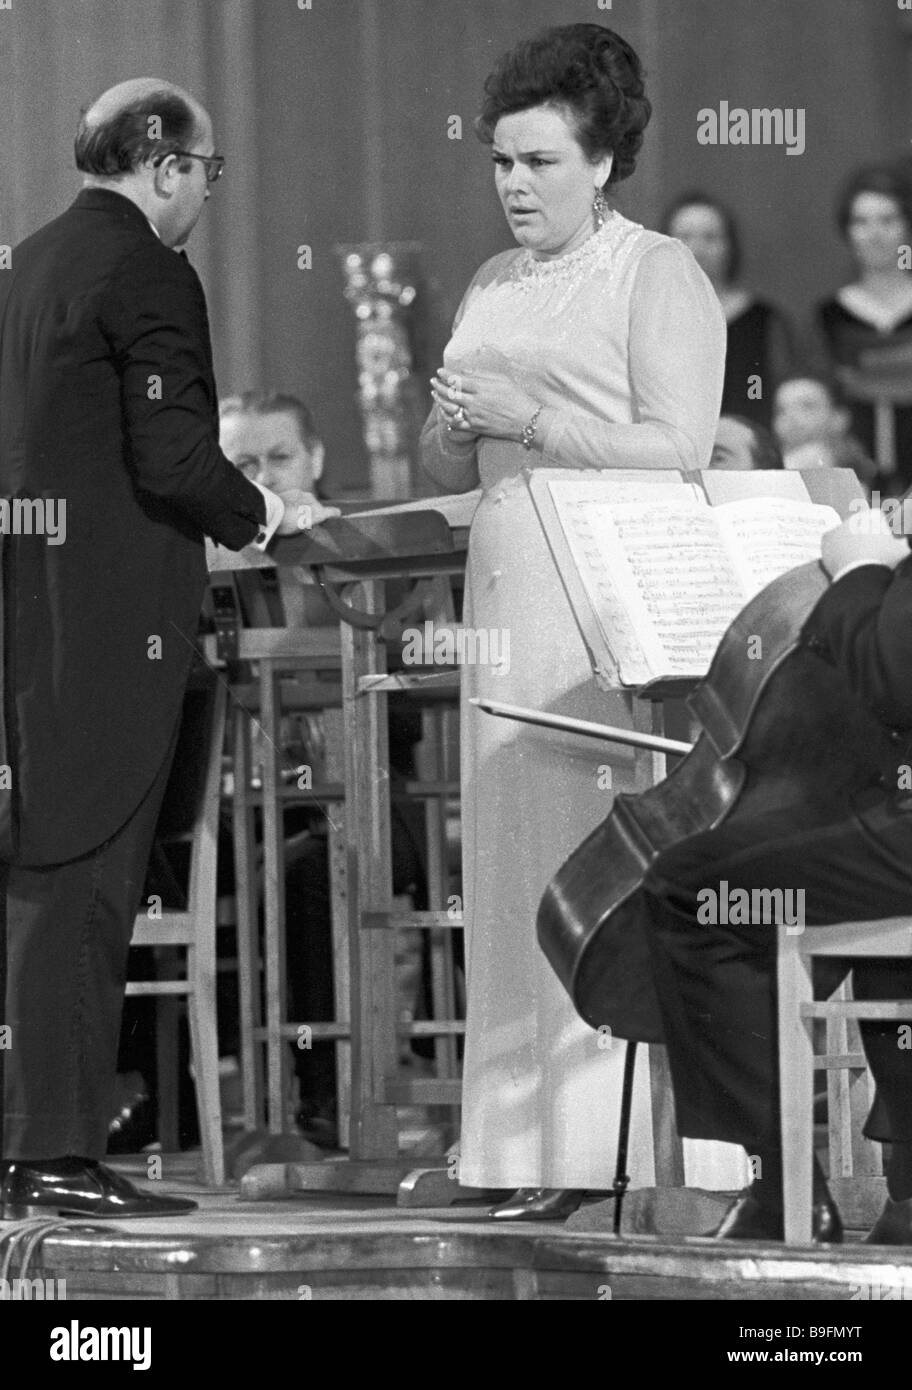 Laureate del 1970 Premio Lenin RSFSR persone s Artiste Lyudmila Zykina perfroms R Shchedrin s oratorio Lenin nel Foto Stock